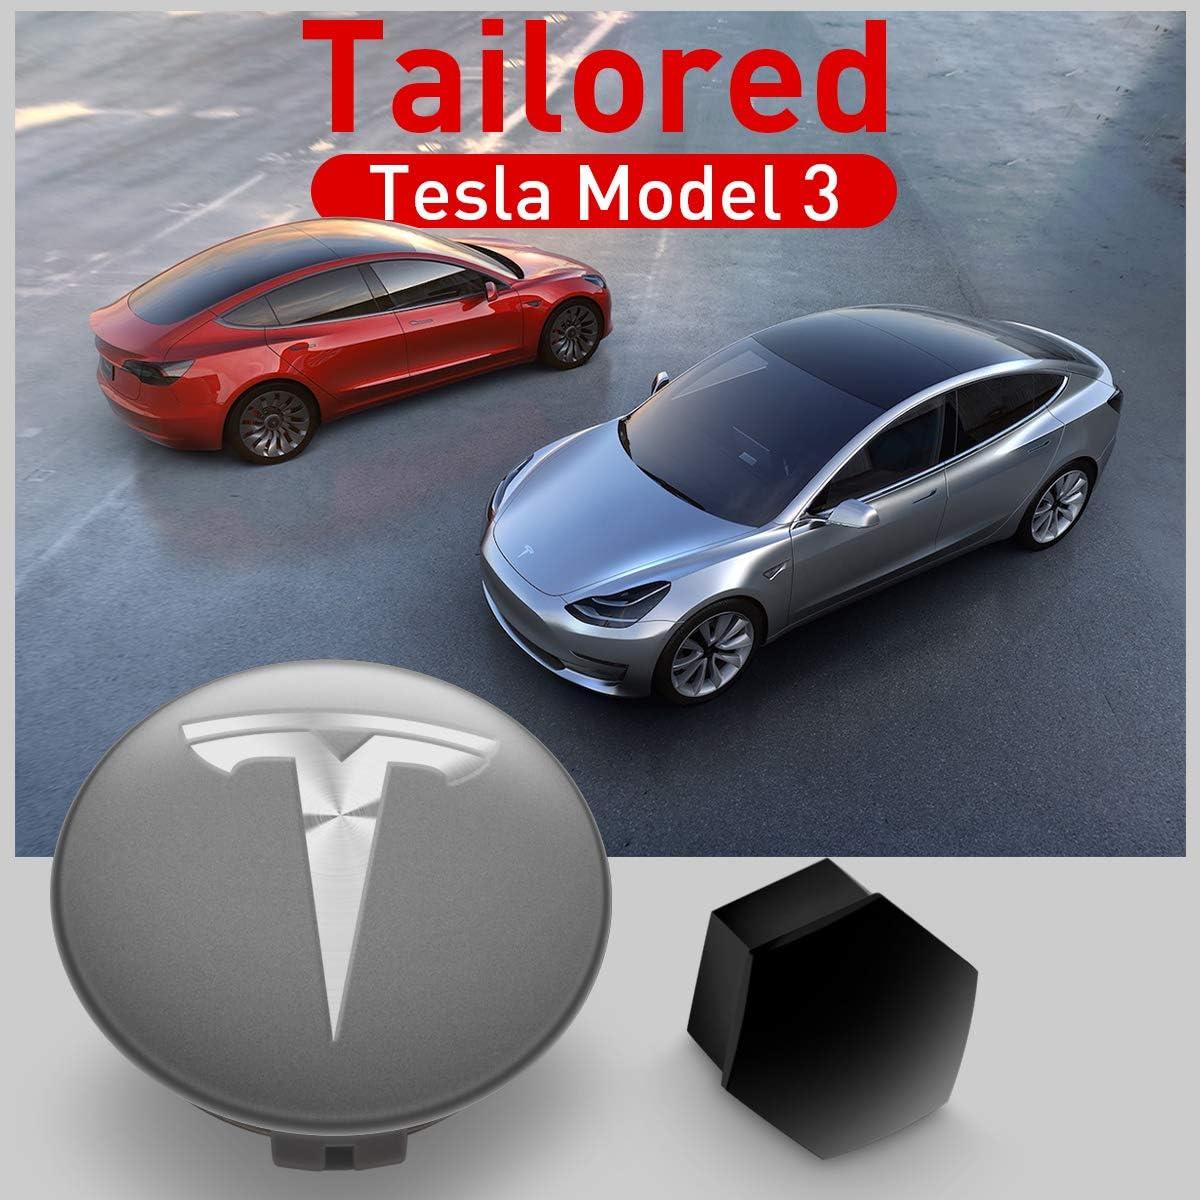 Kfzman Model 3 Radkappe Kit Radnabenabdeckung Kit Mit Logo Für Tesla Model 3 2017 2021 Chrom 25stücke Auto